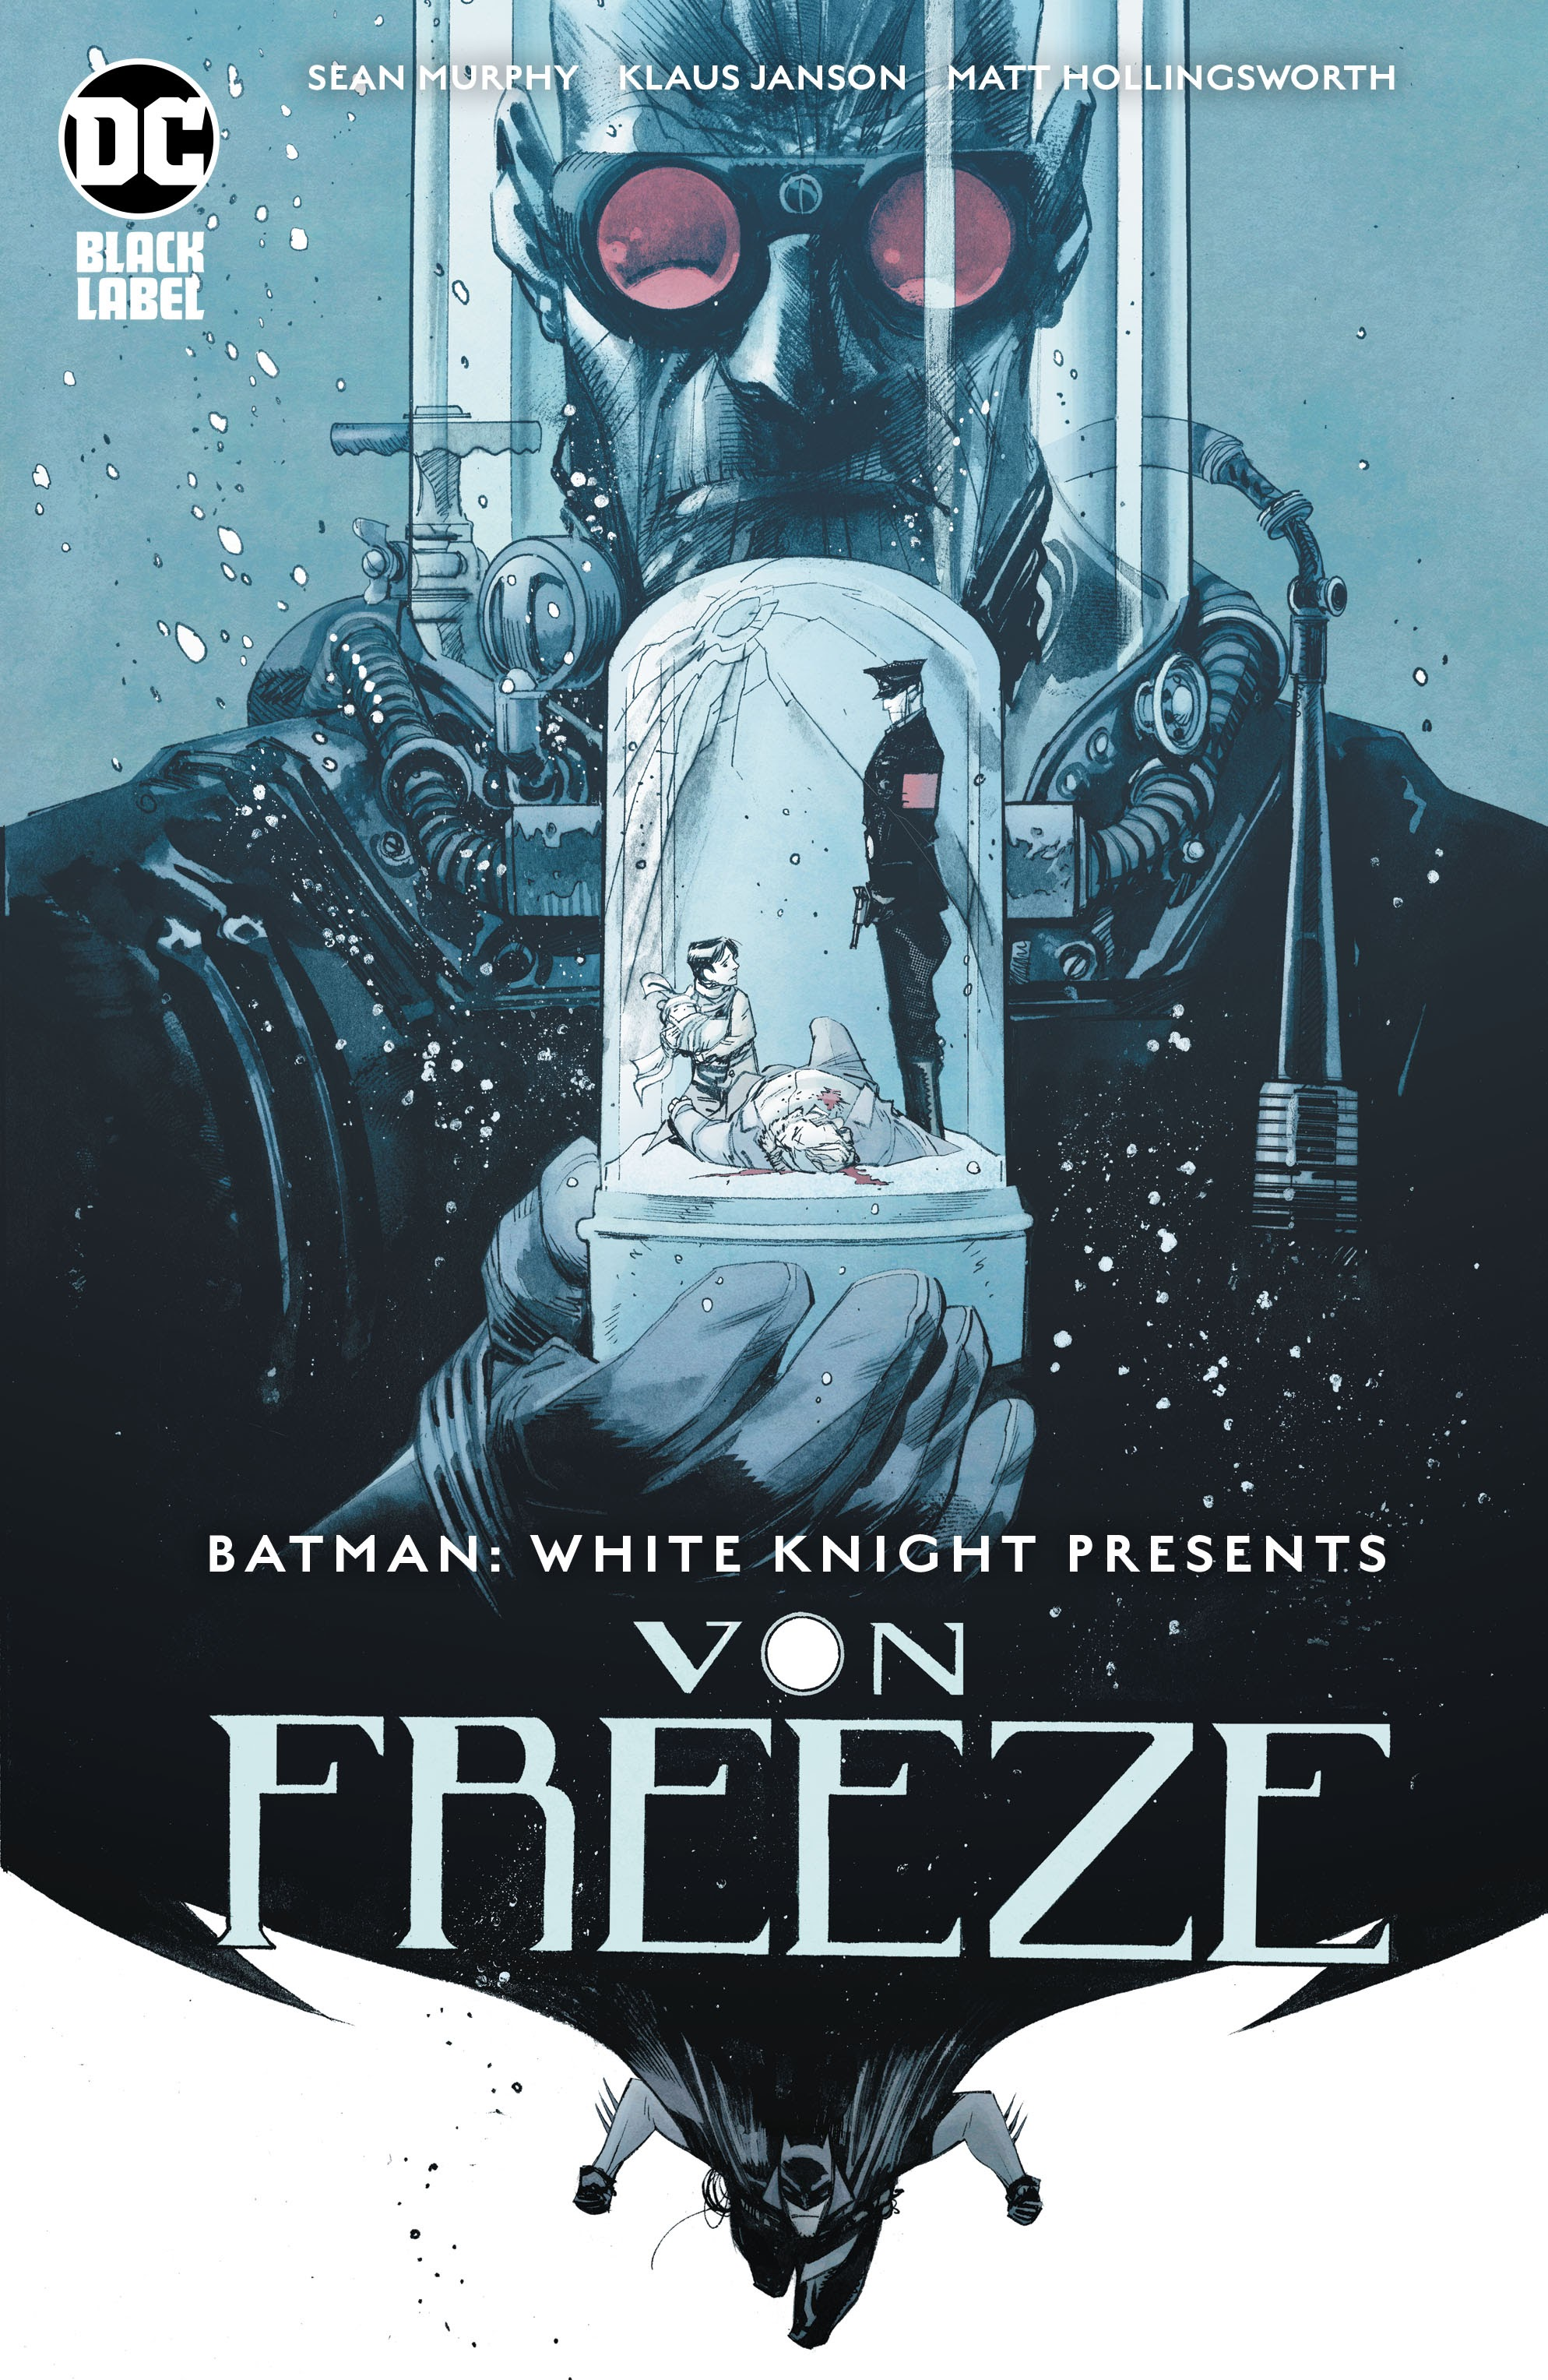 Batman: White Knight Presents Von Freeze Full Page 1